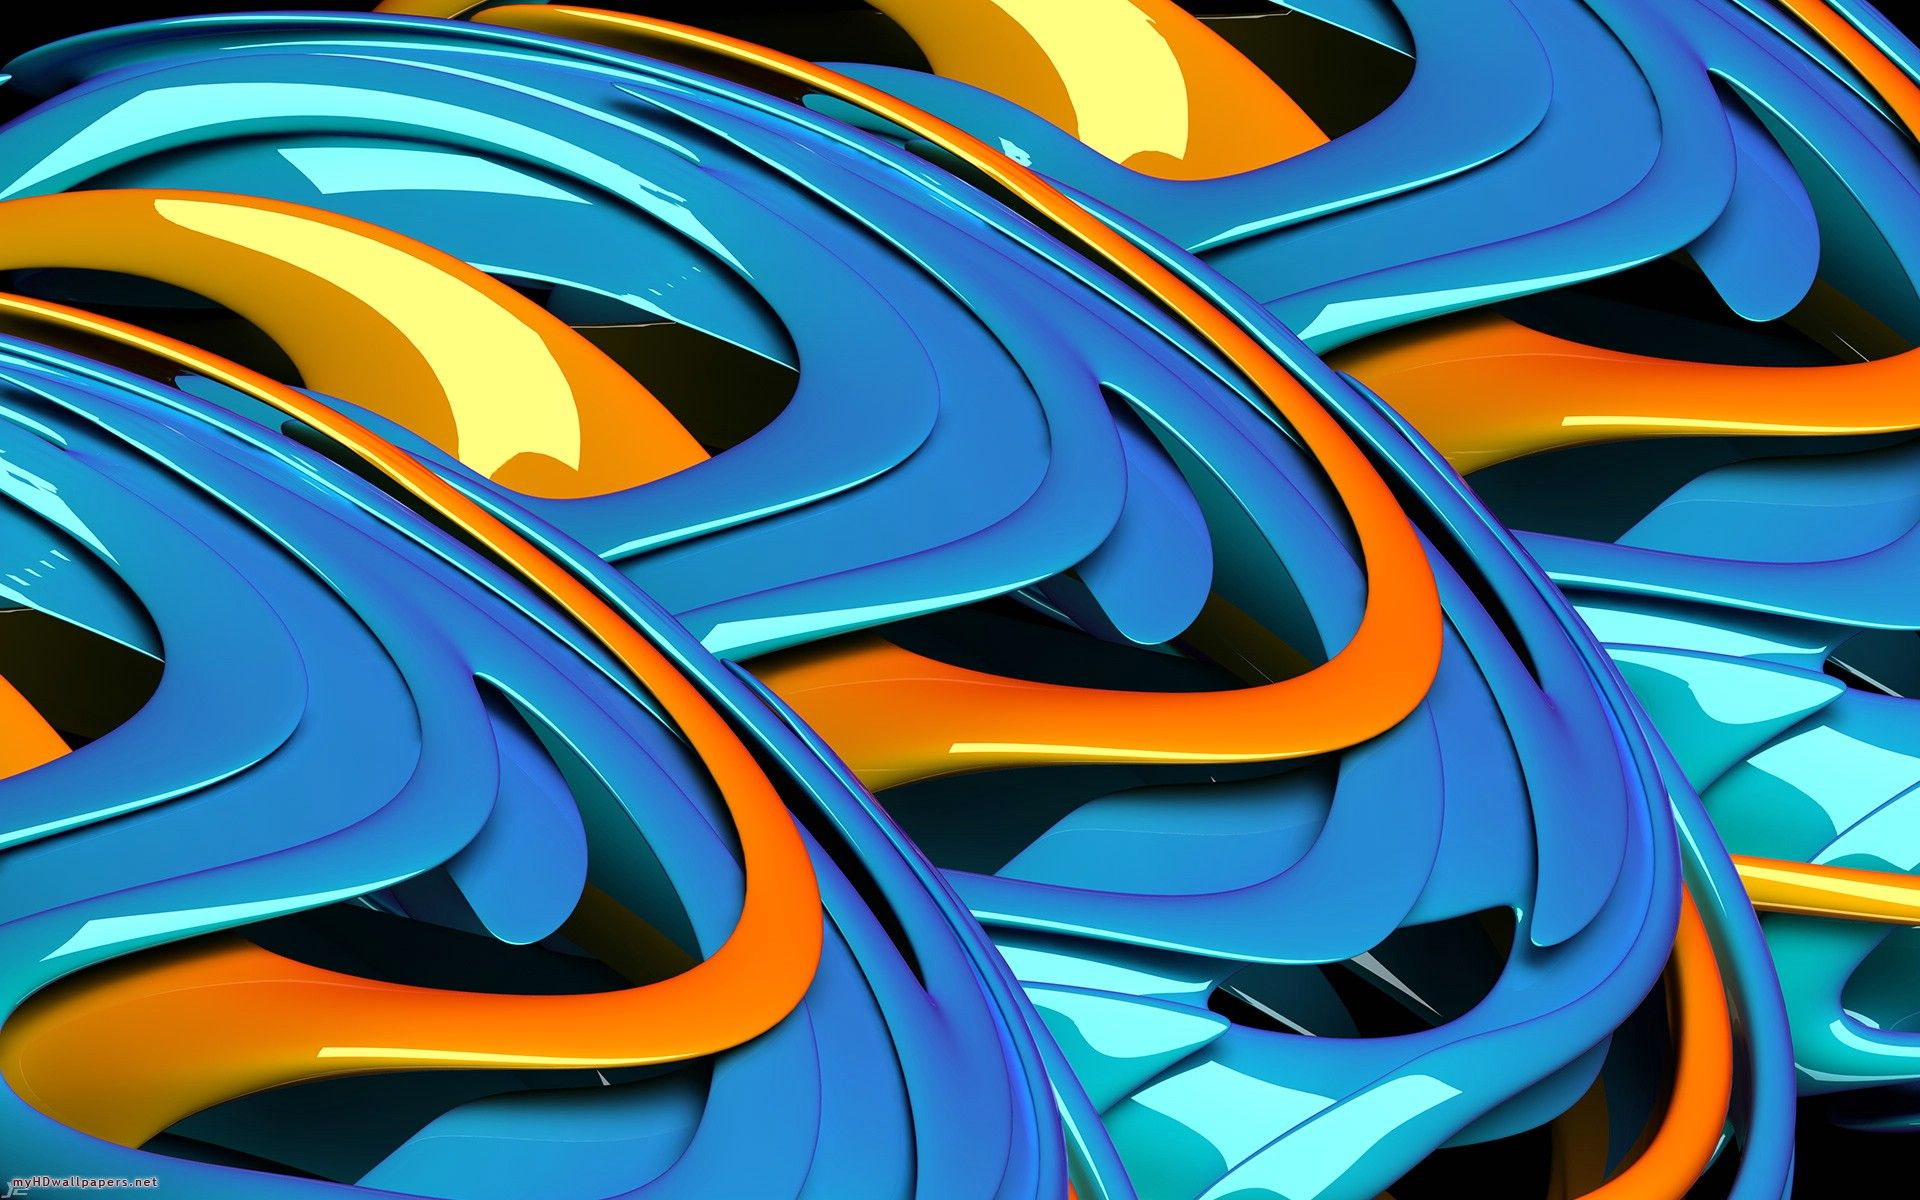 Wallpaper download free image search 3d - 3d Hd Blue Orange Free Desktop Wallpaper Hd Wallpapers Download